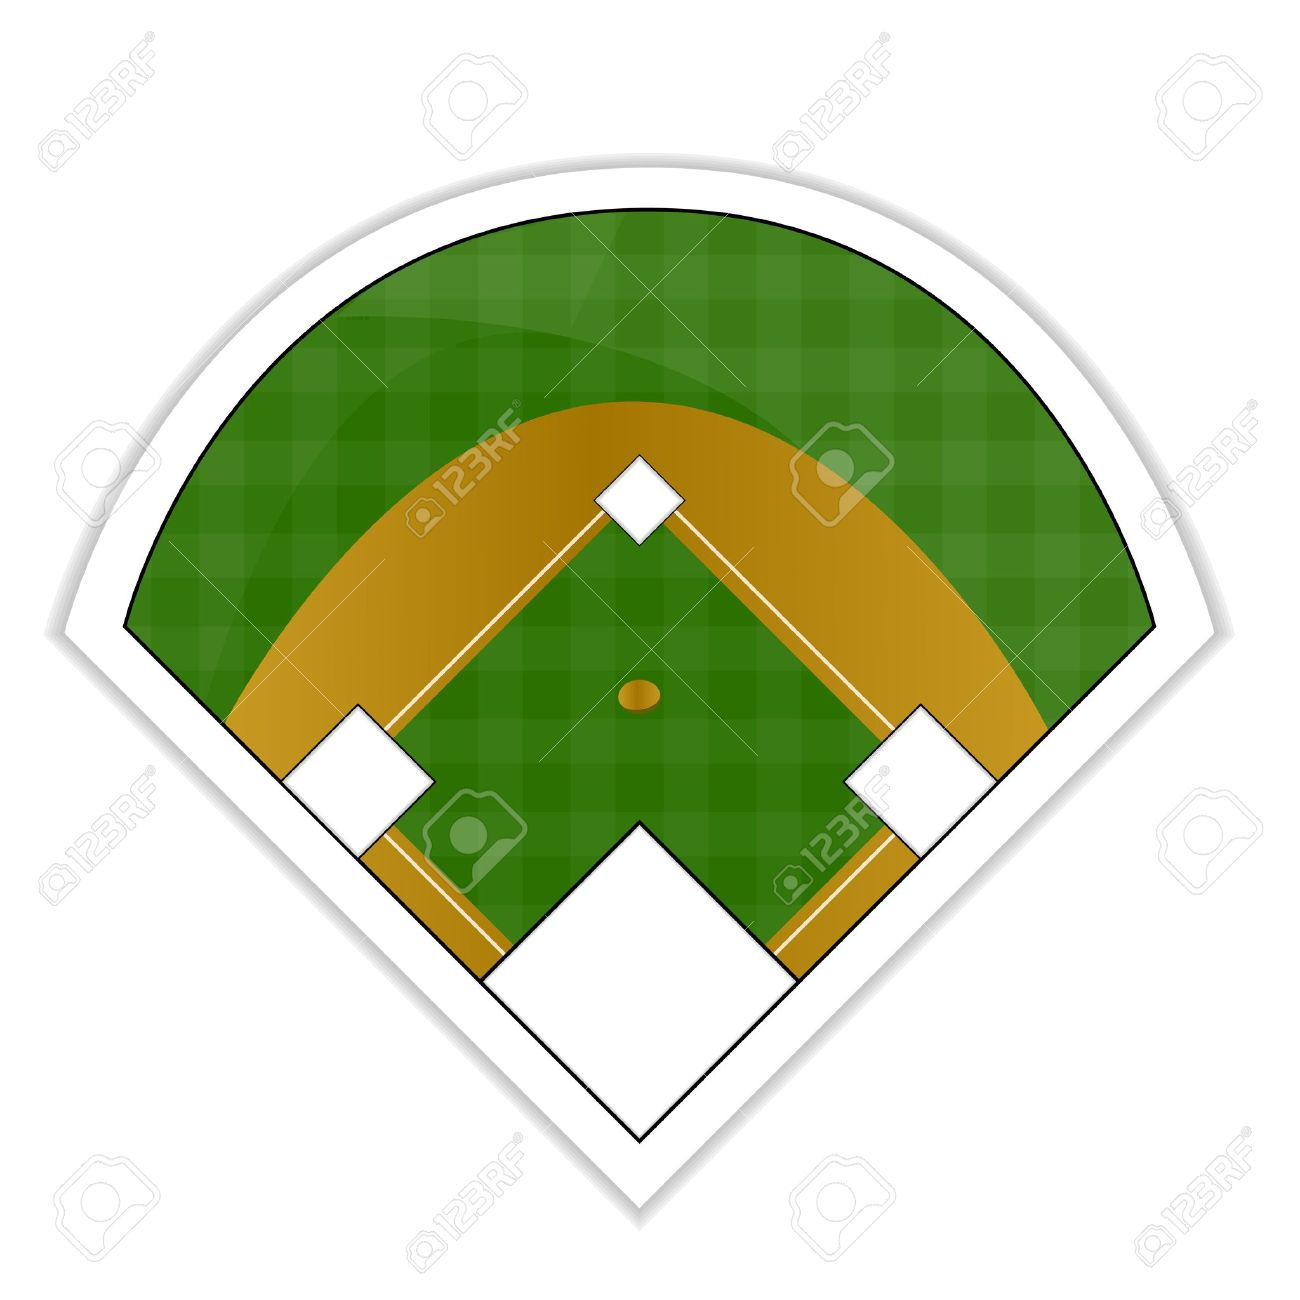 baseball field sticker royalty free cliparts vectors and stock rh 123rf com Baseball Graphics Baseball Field Graphic